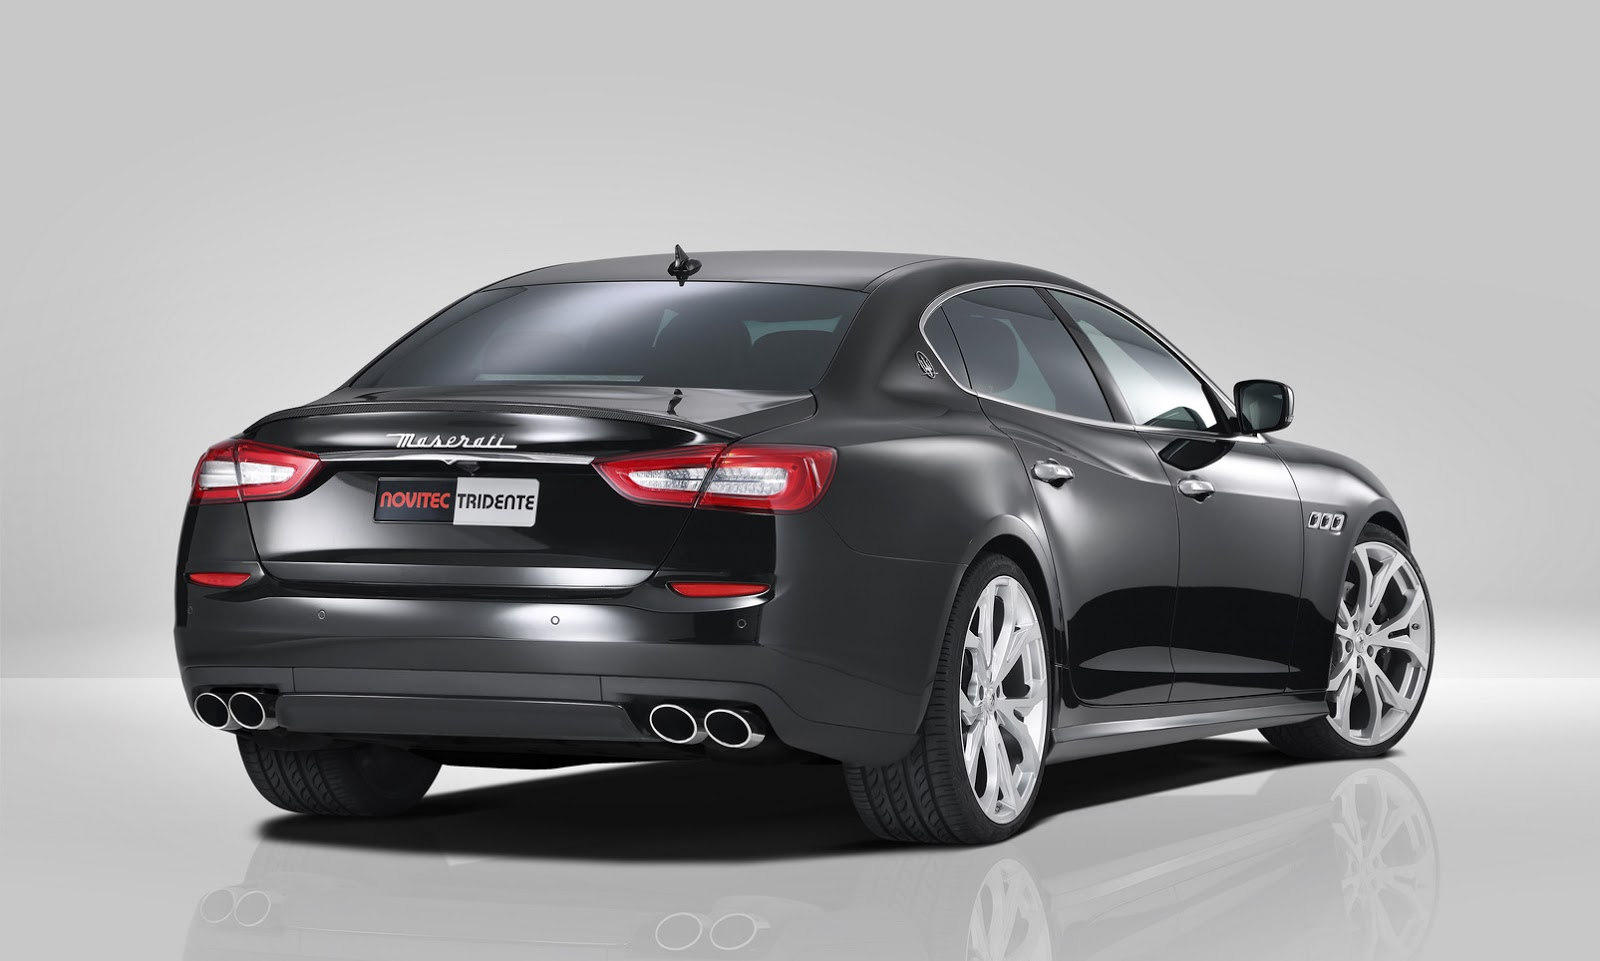 Novitec Powers Up New Maserati Quattroporte Carscoops